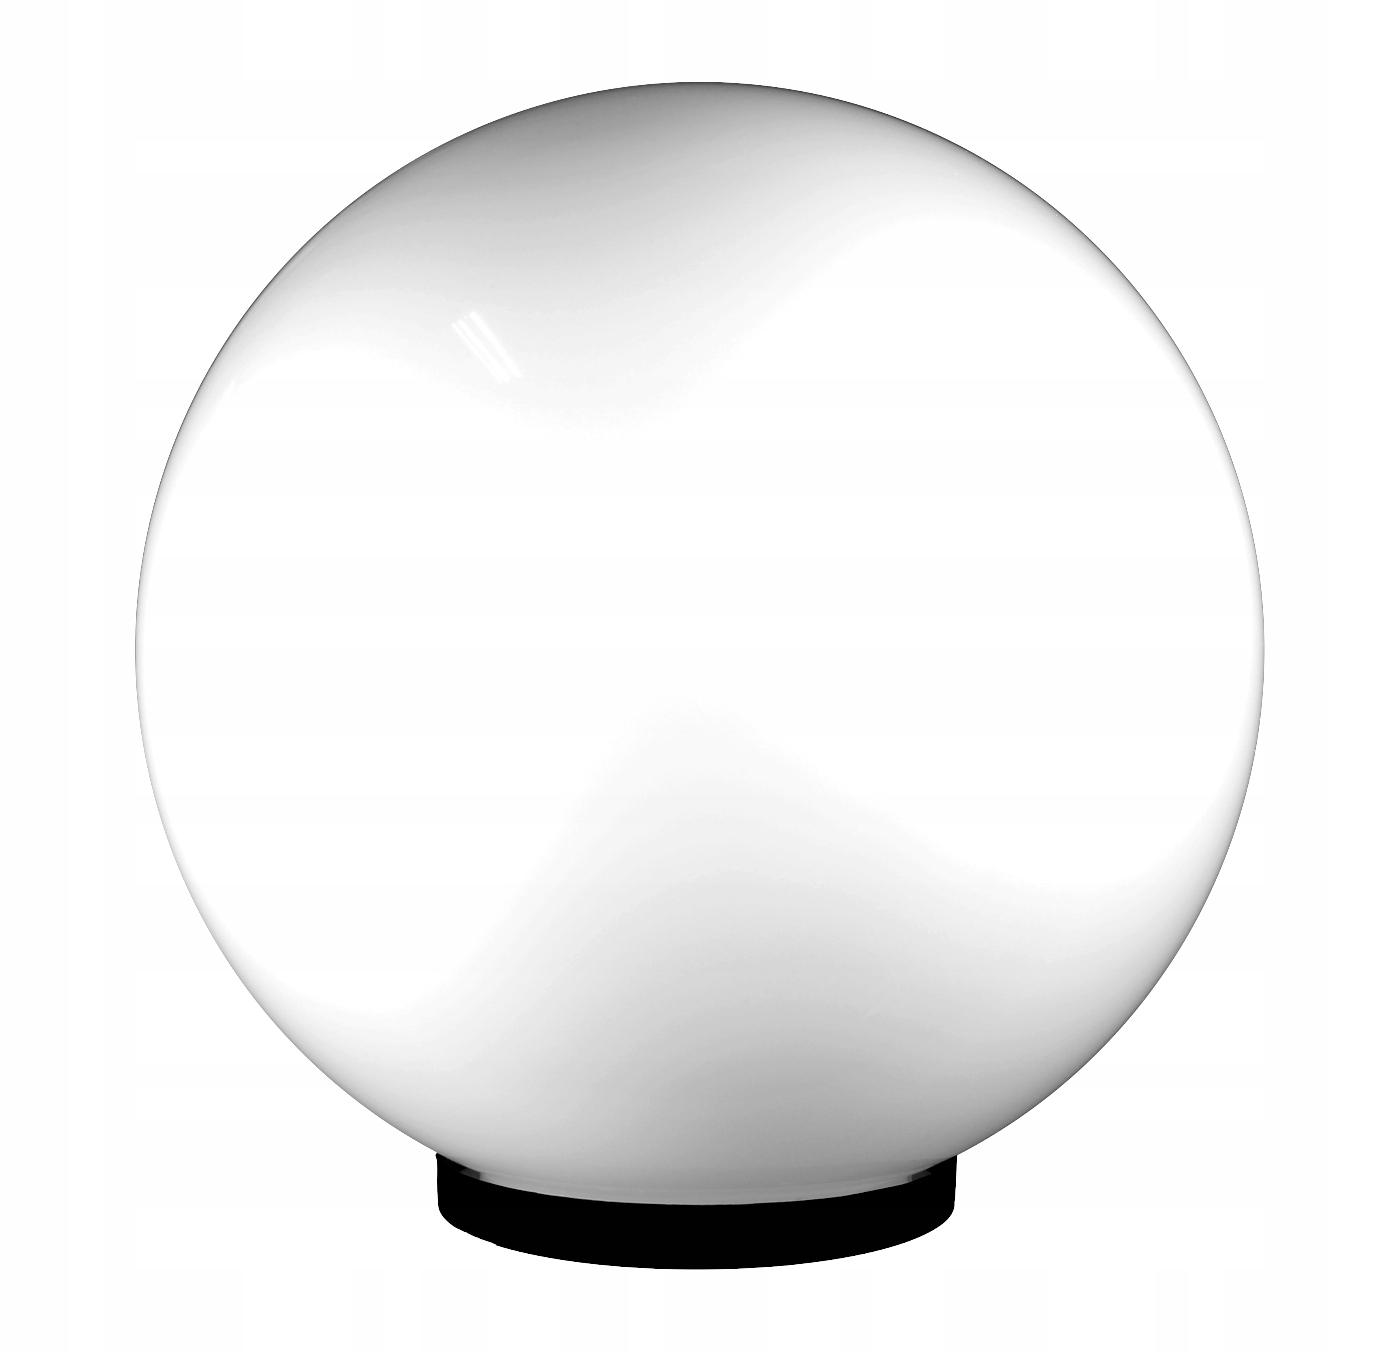 Kule ogrodowe - kula ogrodowa biała 40cm + oprawa